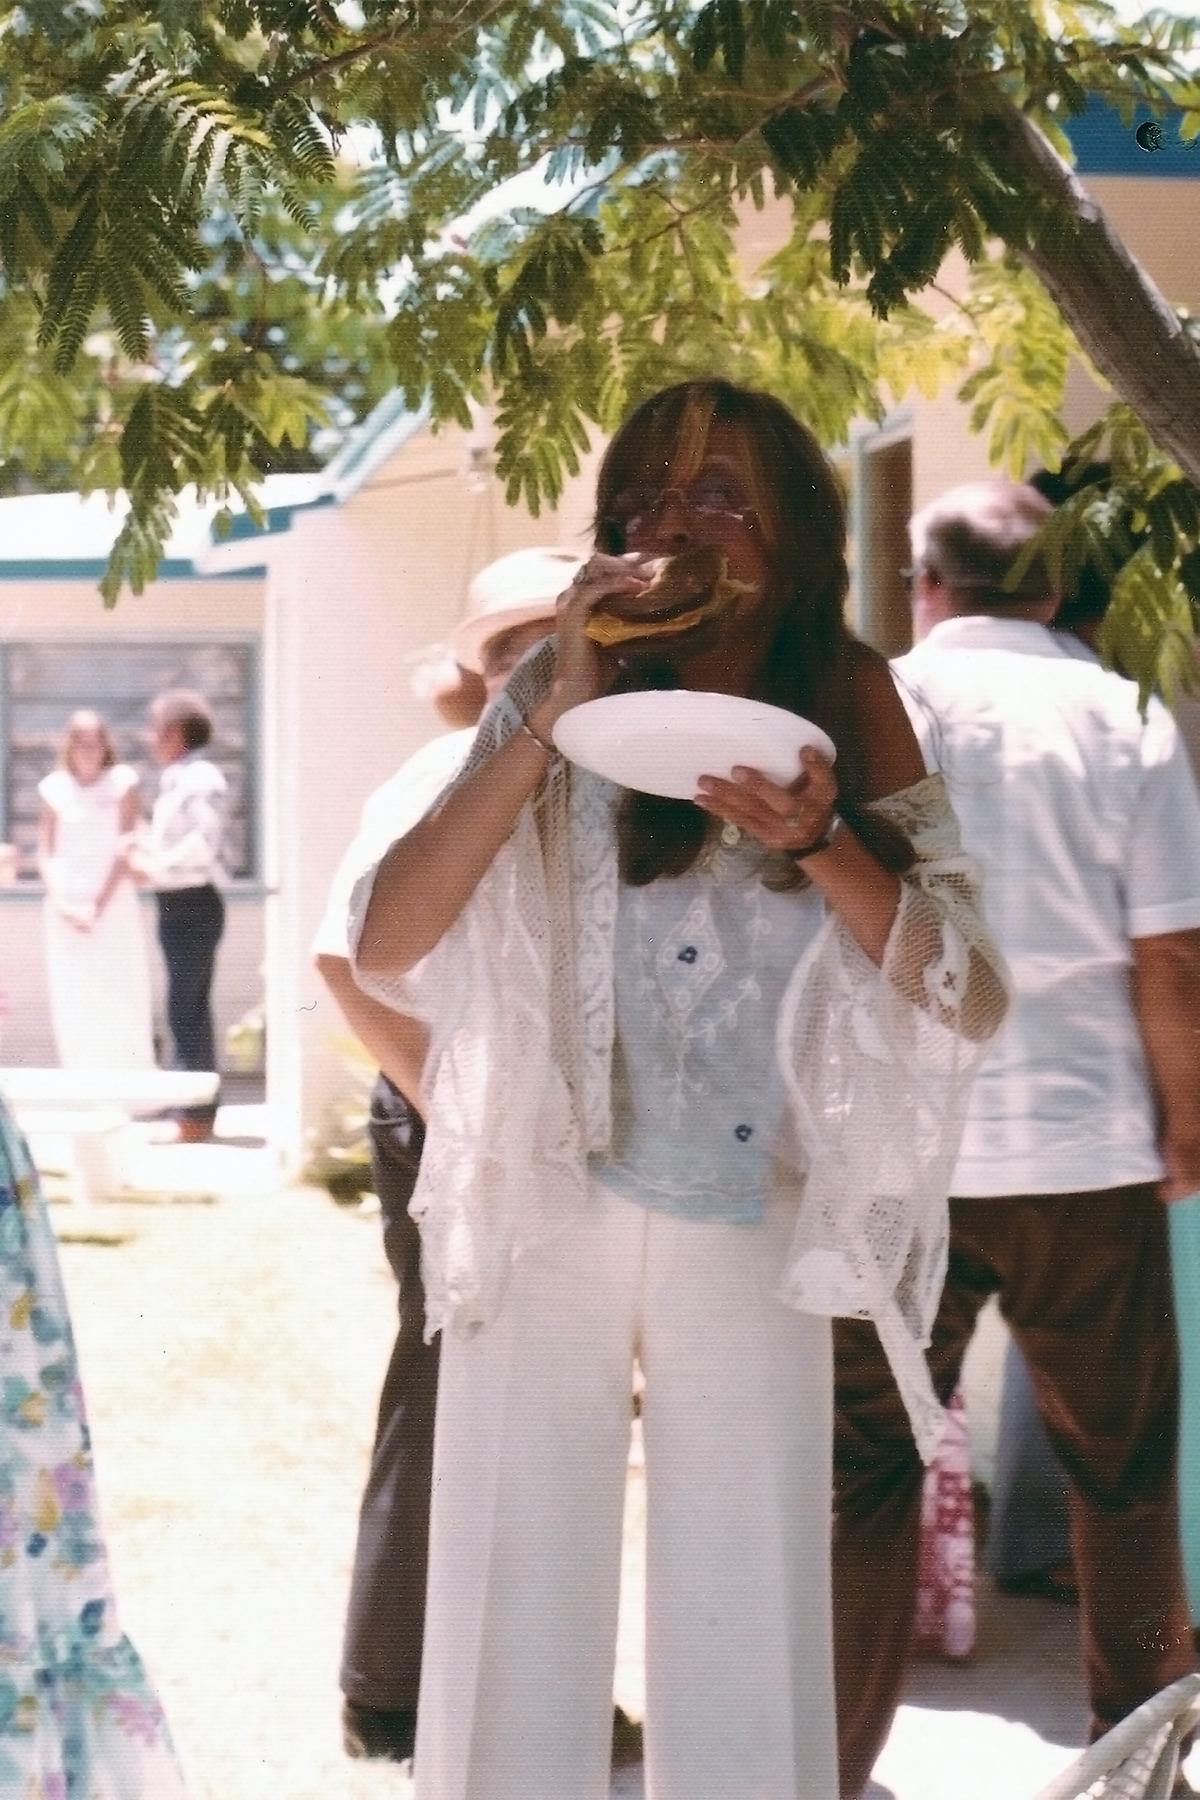 judee sill eating